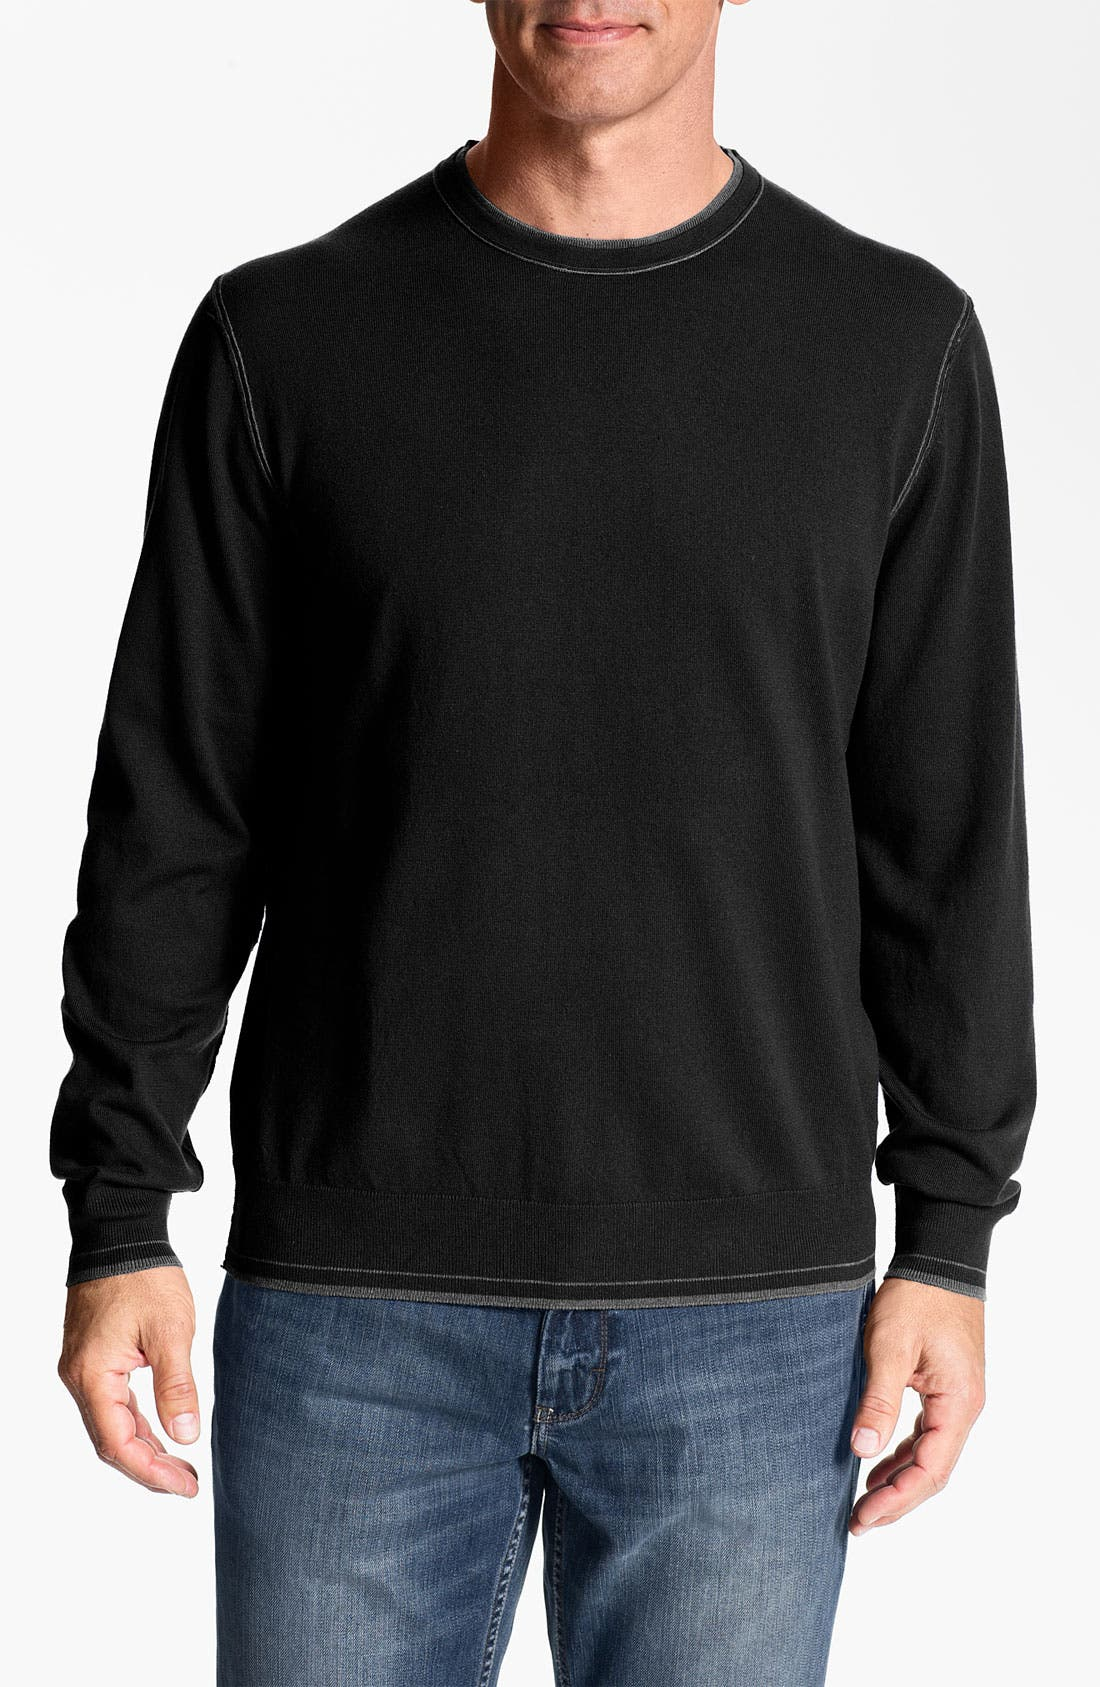 Alternate Image 1 Selected - Tommy Bahama 'Johnny Cashmere' Crewneck Cashmere Blend Sweater